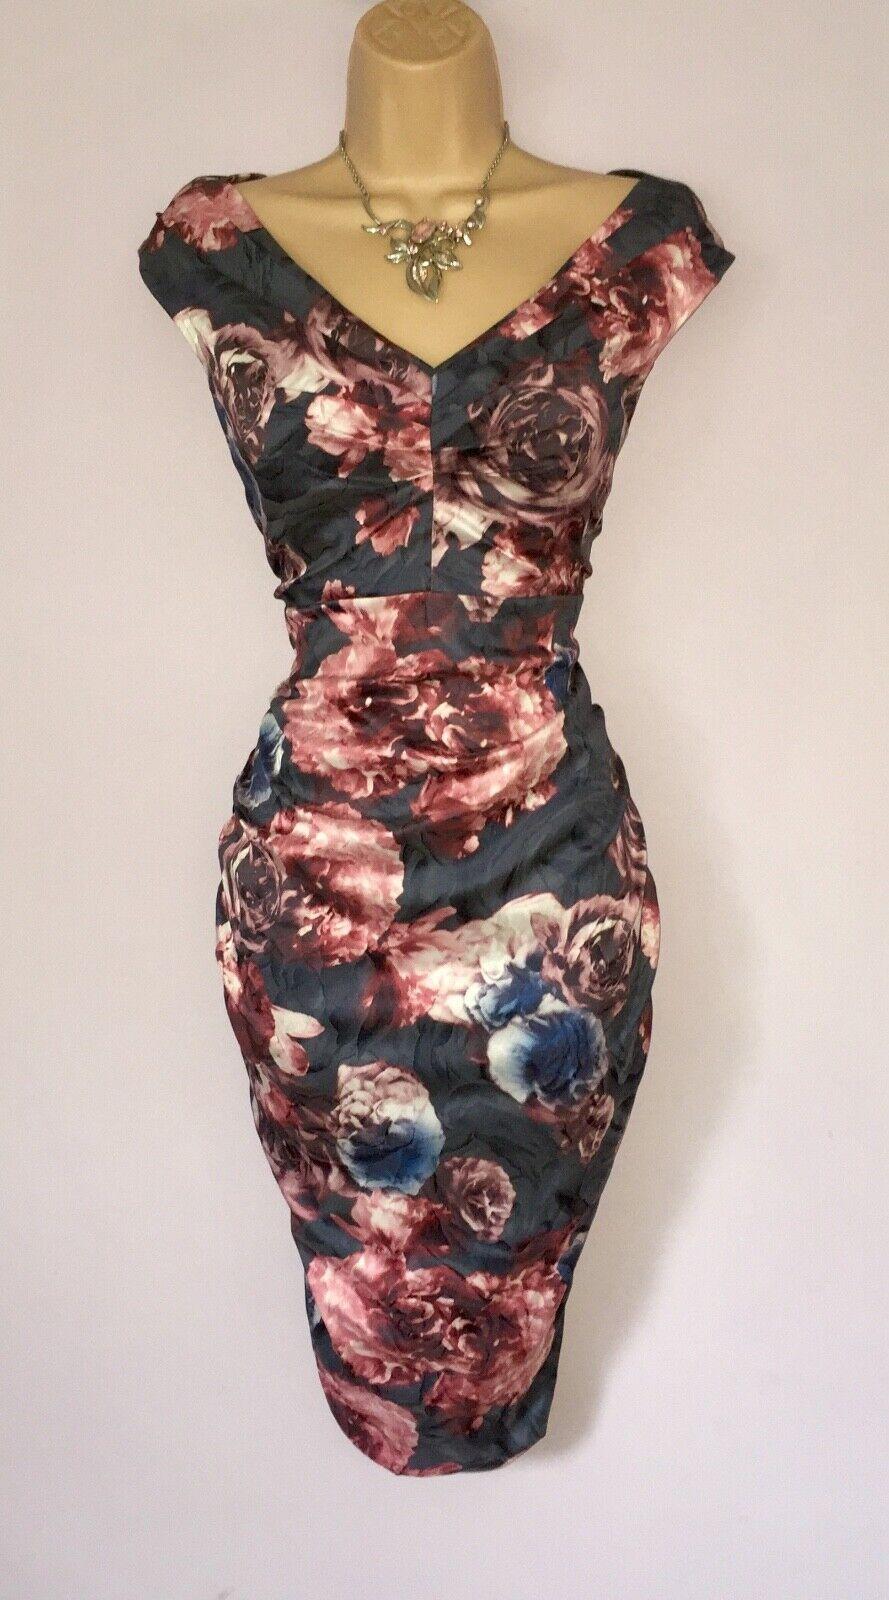 ELEGANT PHASE EIGHT DRESS UK 14 STRETCH BODYCON COCKTAIL DRESS BNWT